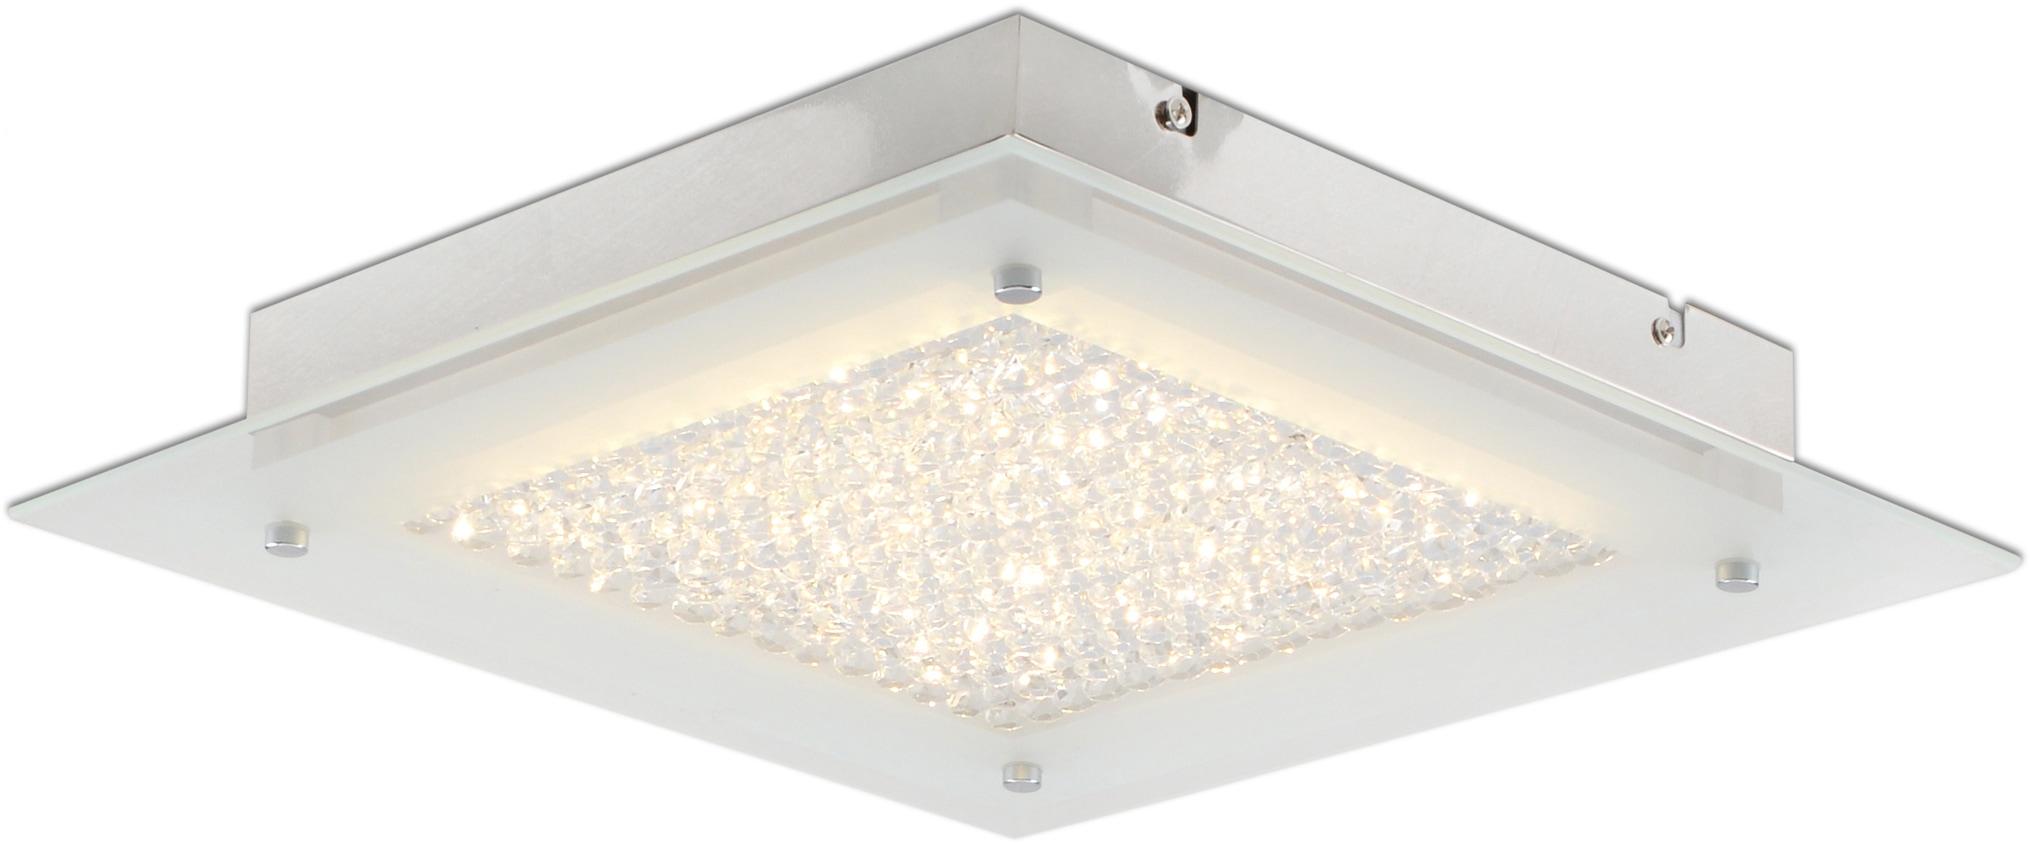 näve LED Deckenleuchte Kristall